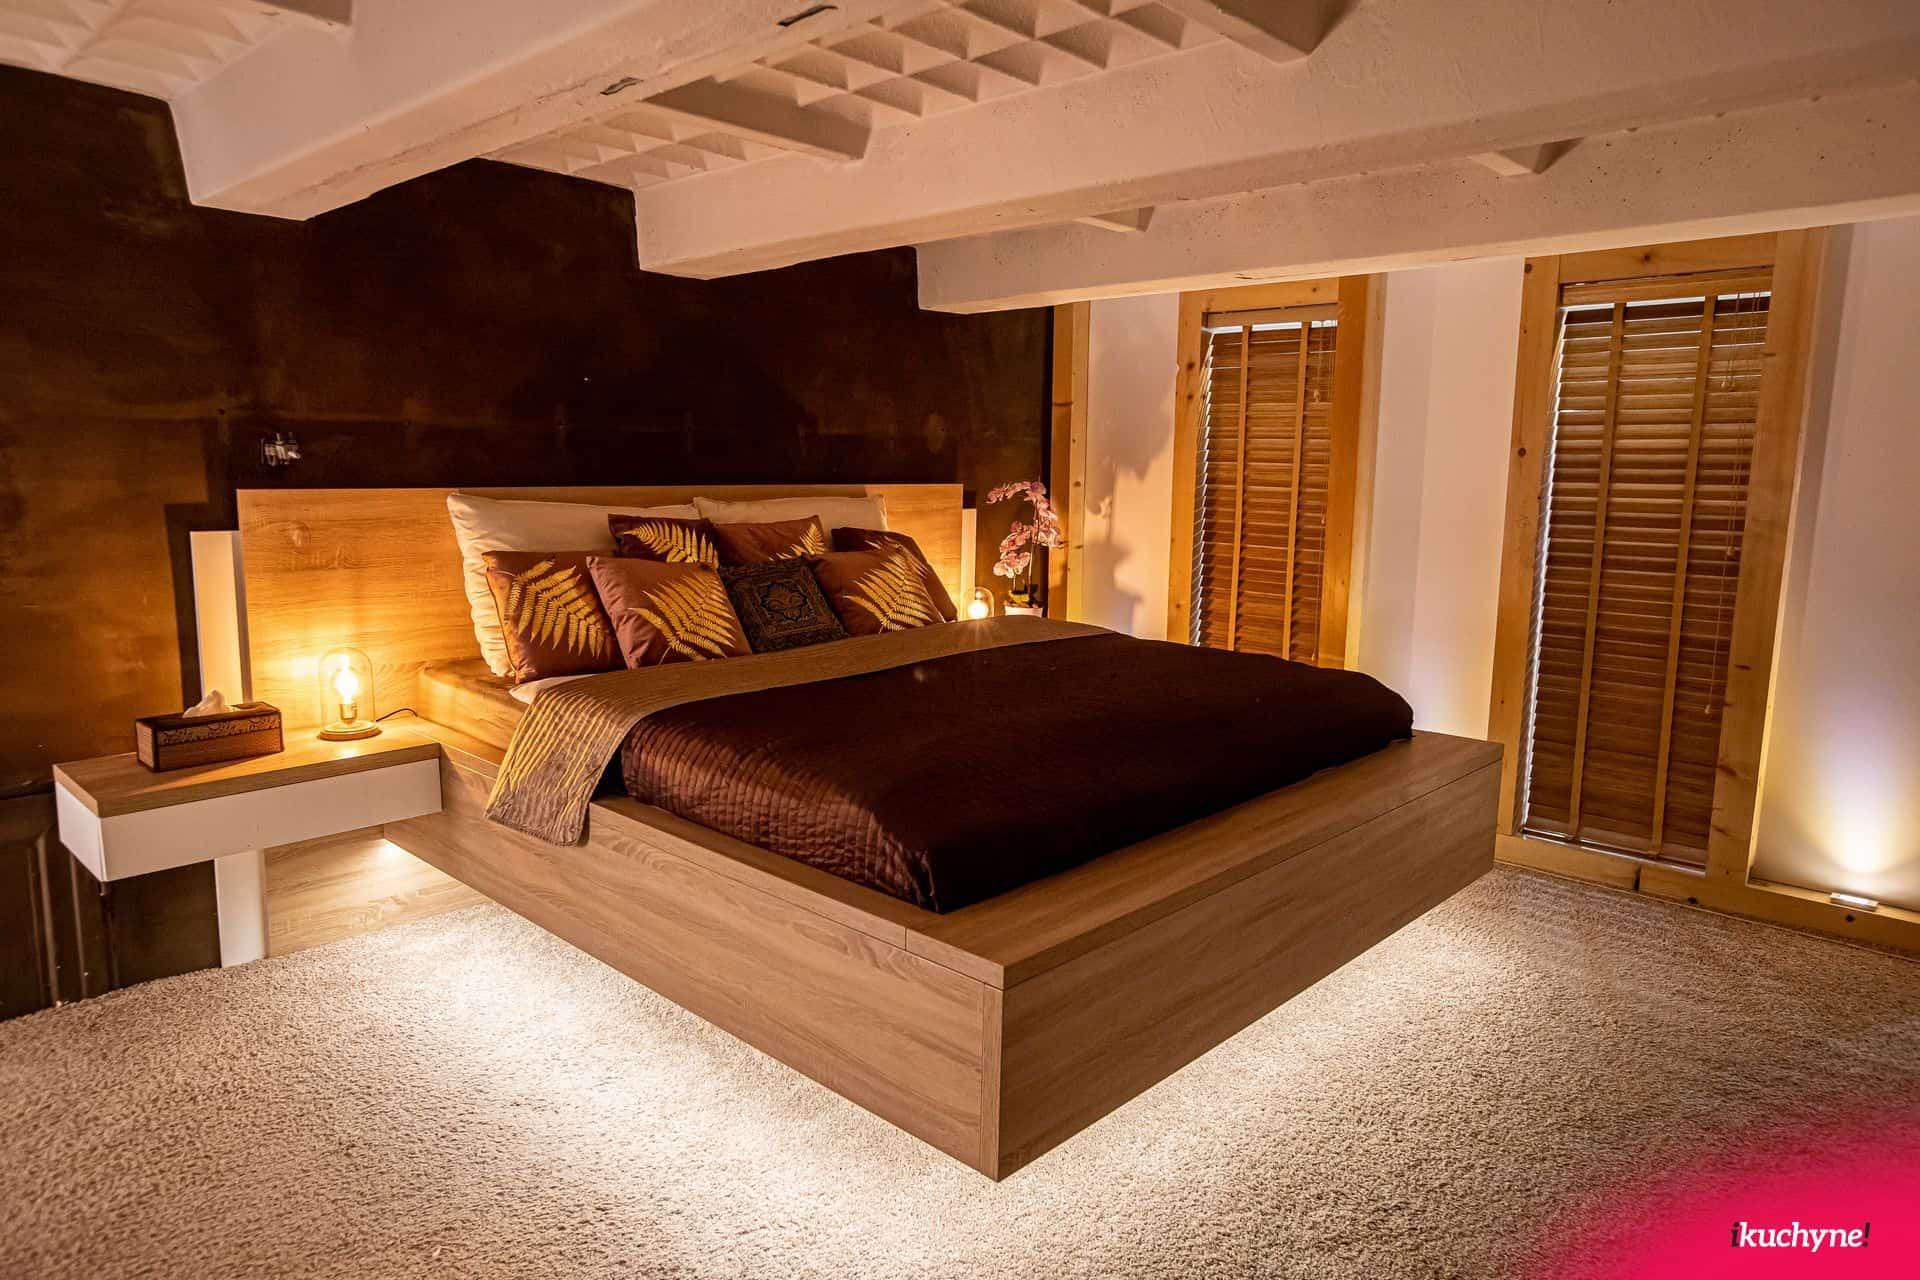 levitujuca postel loft ikuchyne